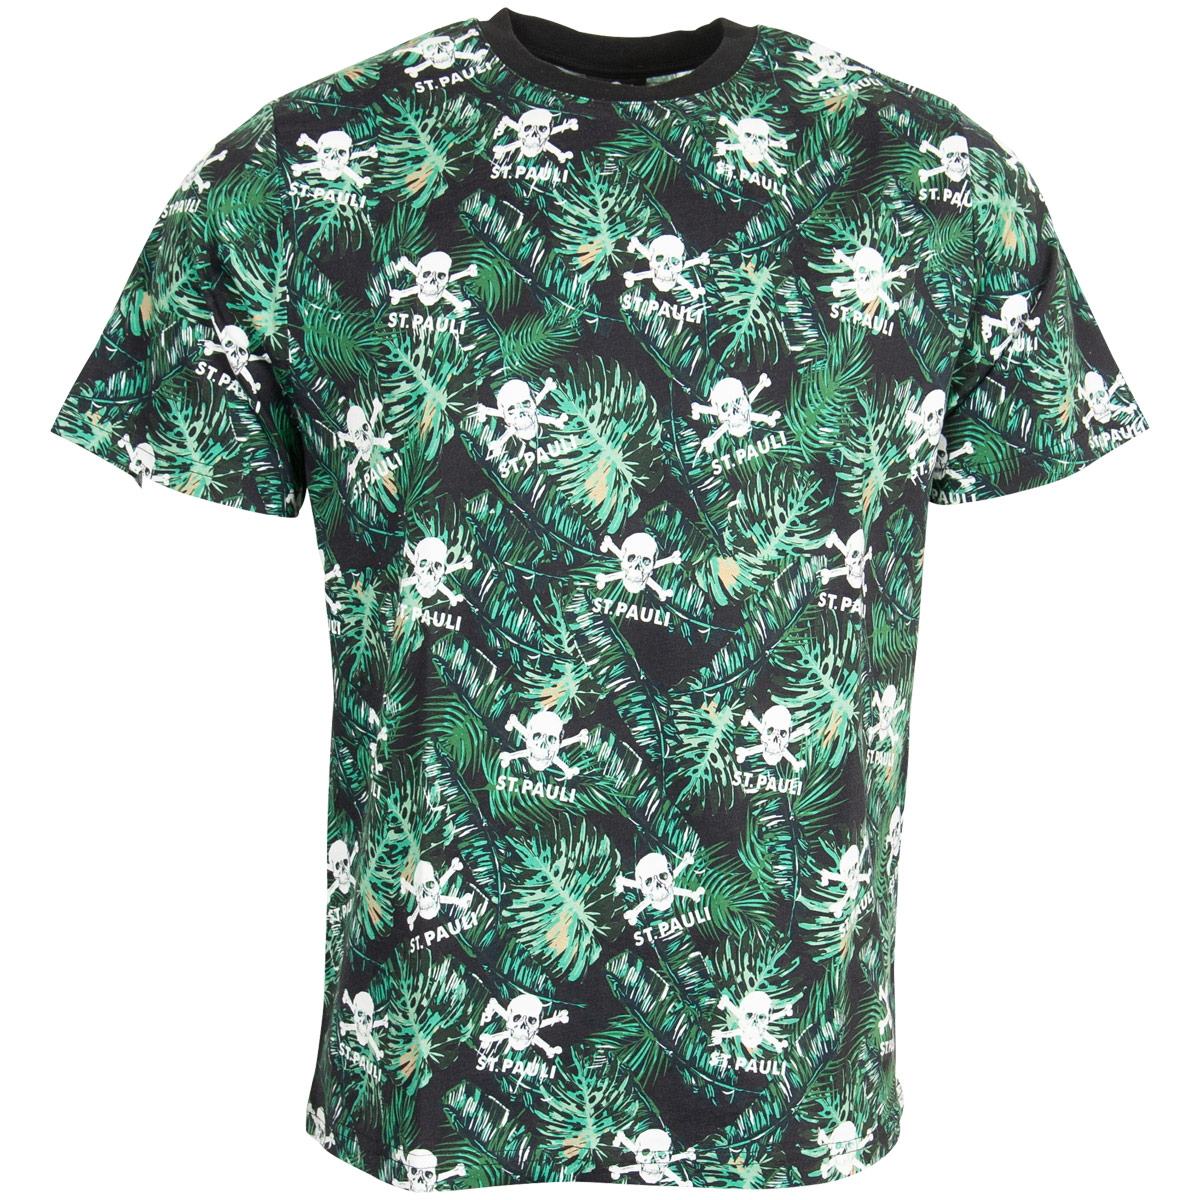 FC St. Pauli - T-Shirt Totenkopf Palme - schwarz-grün